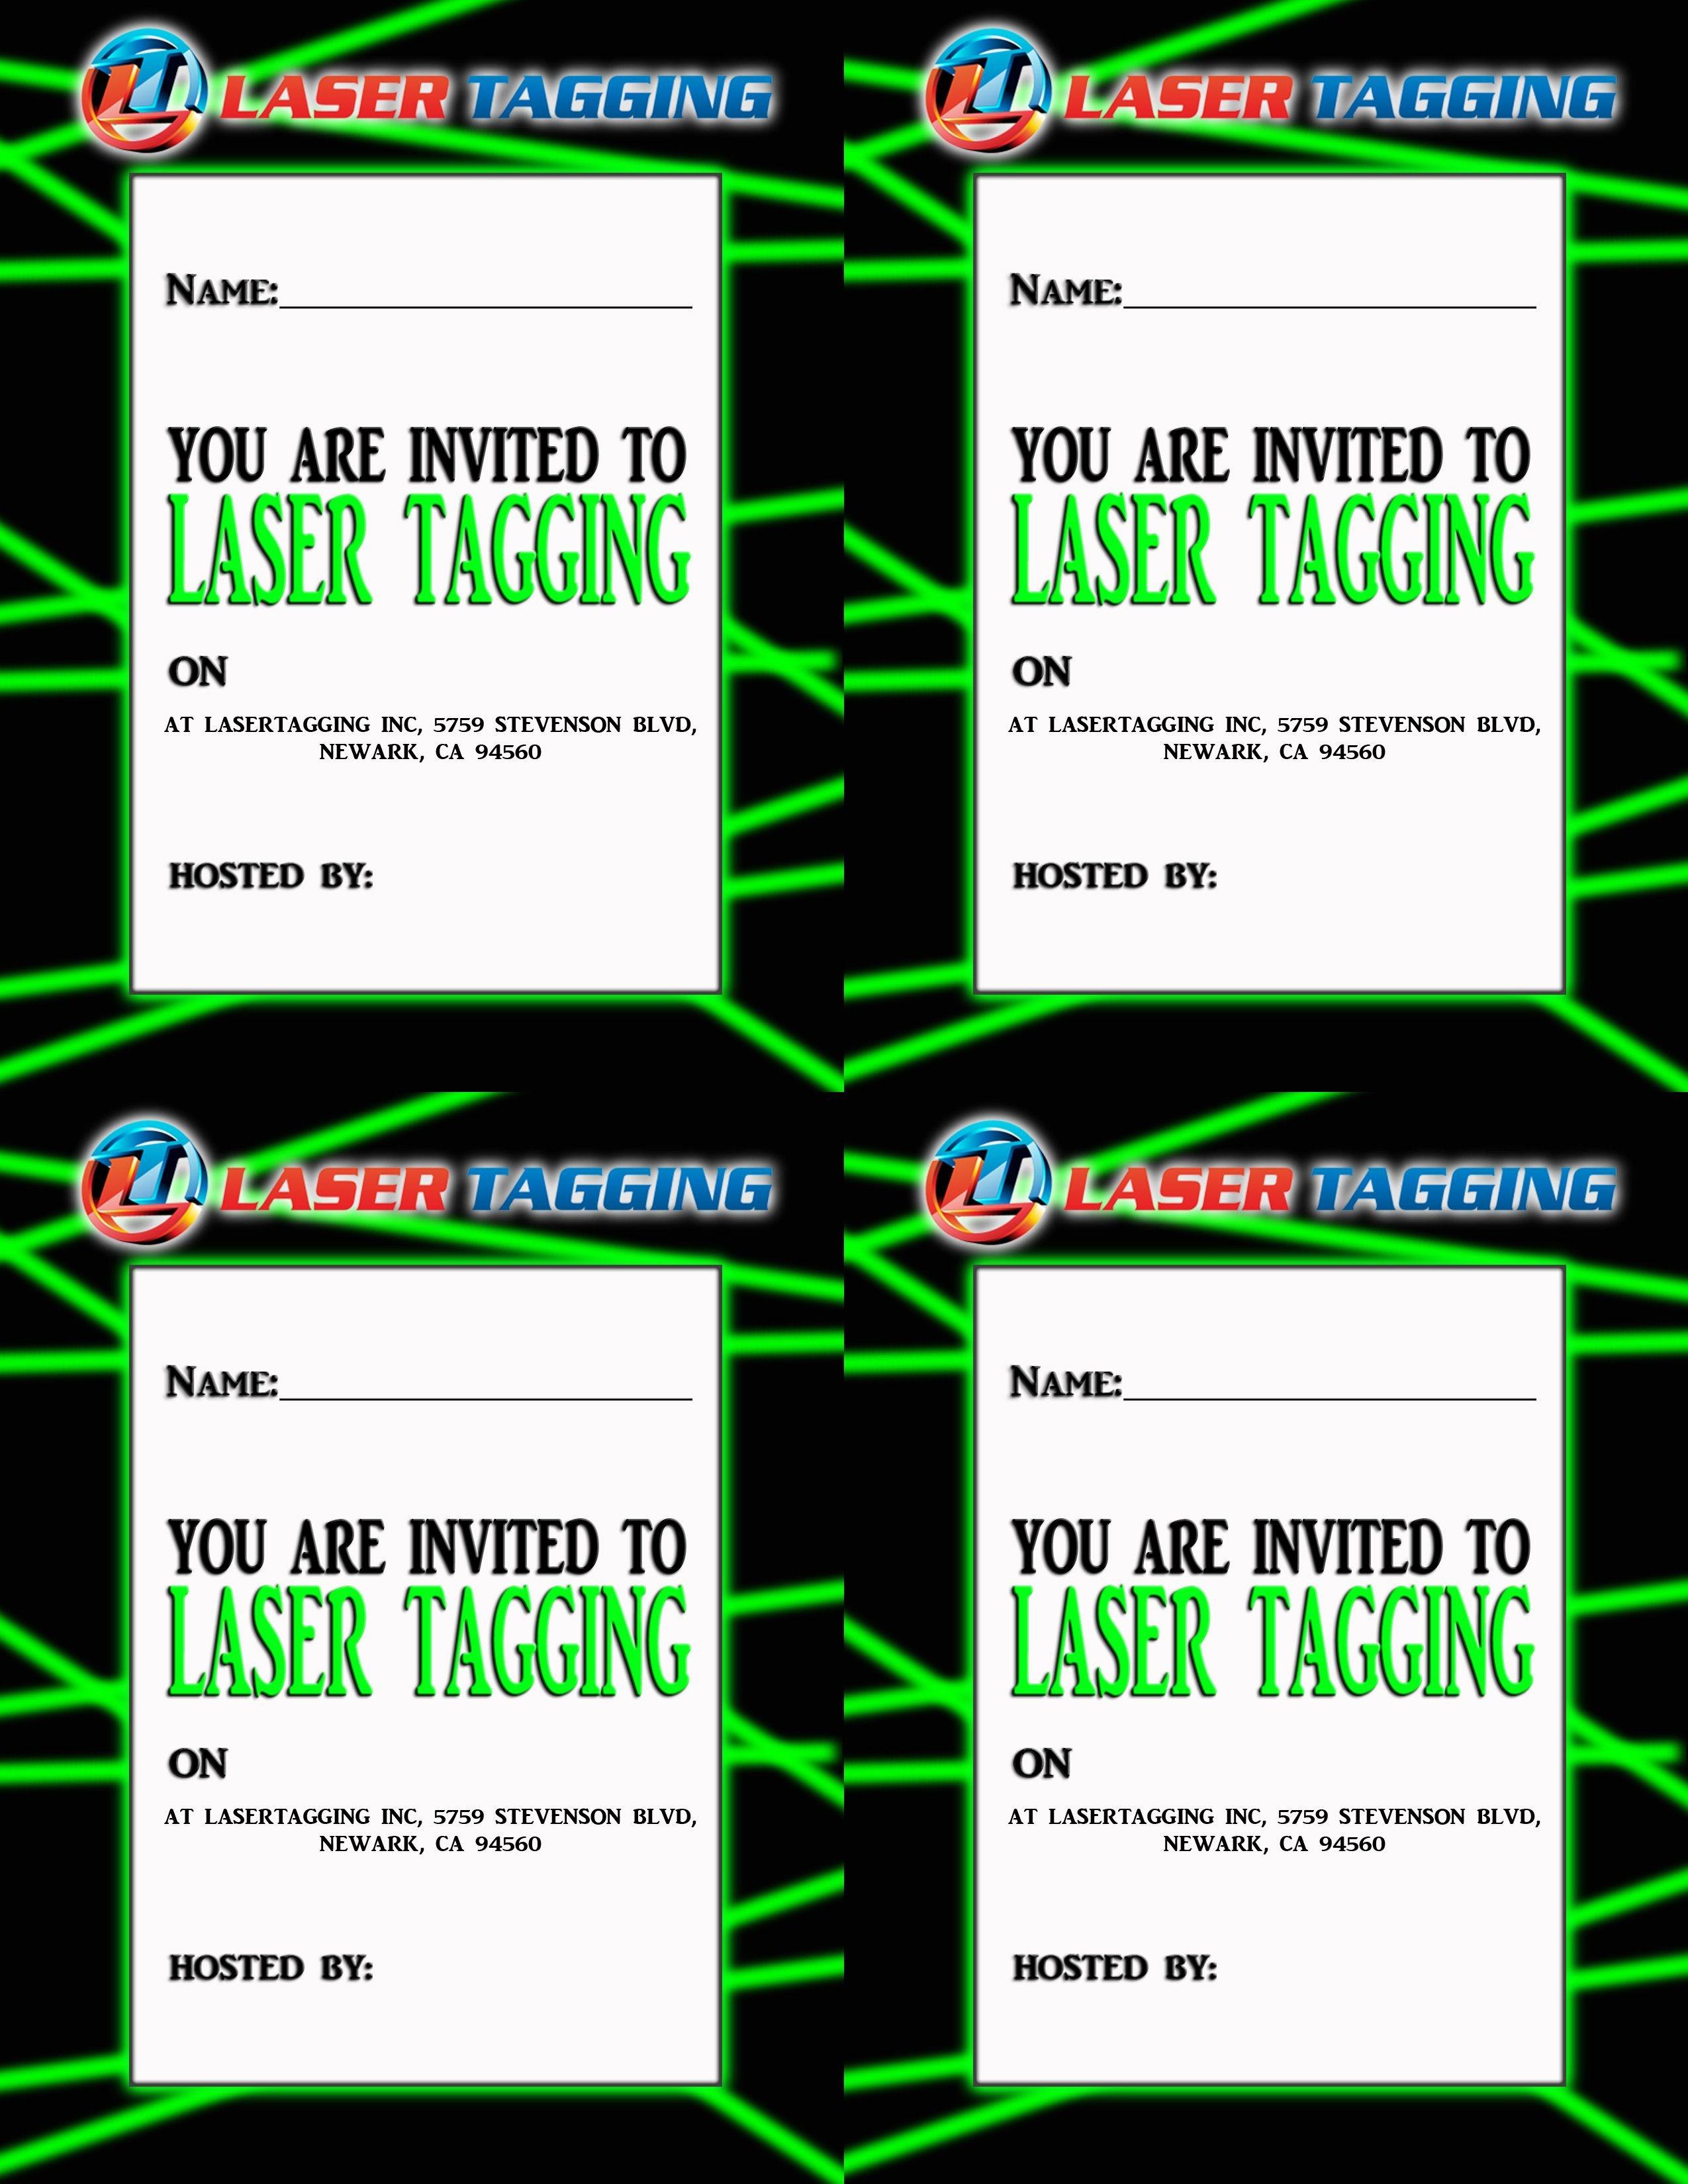 Laser Tag Free Printables | Laser Tag Invitations Printable Free - Free Printable Laser Tag Invitation Template